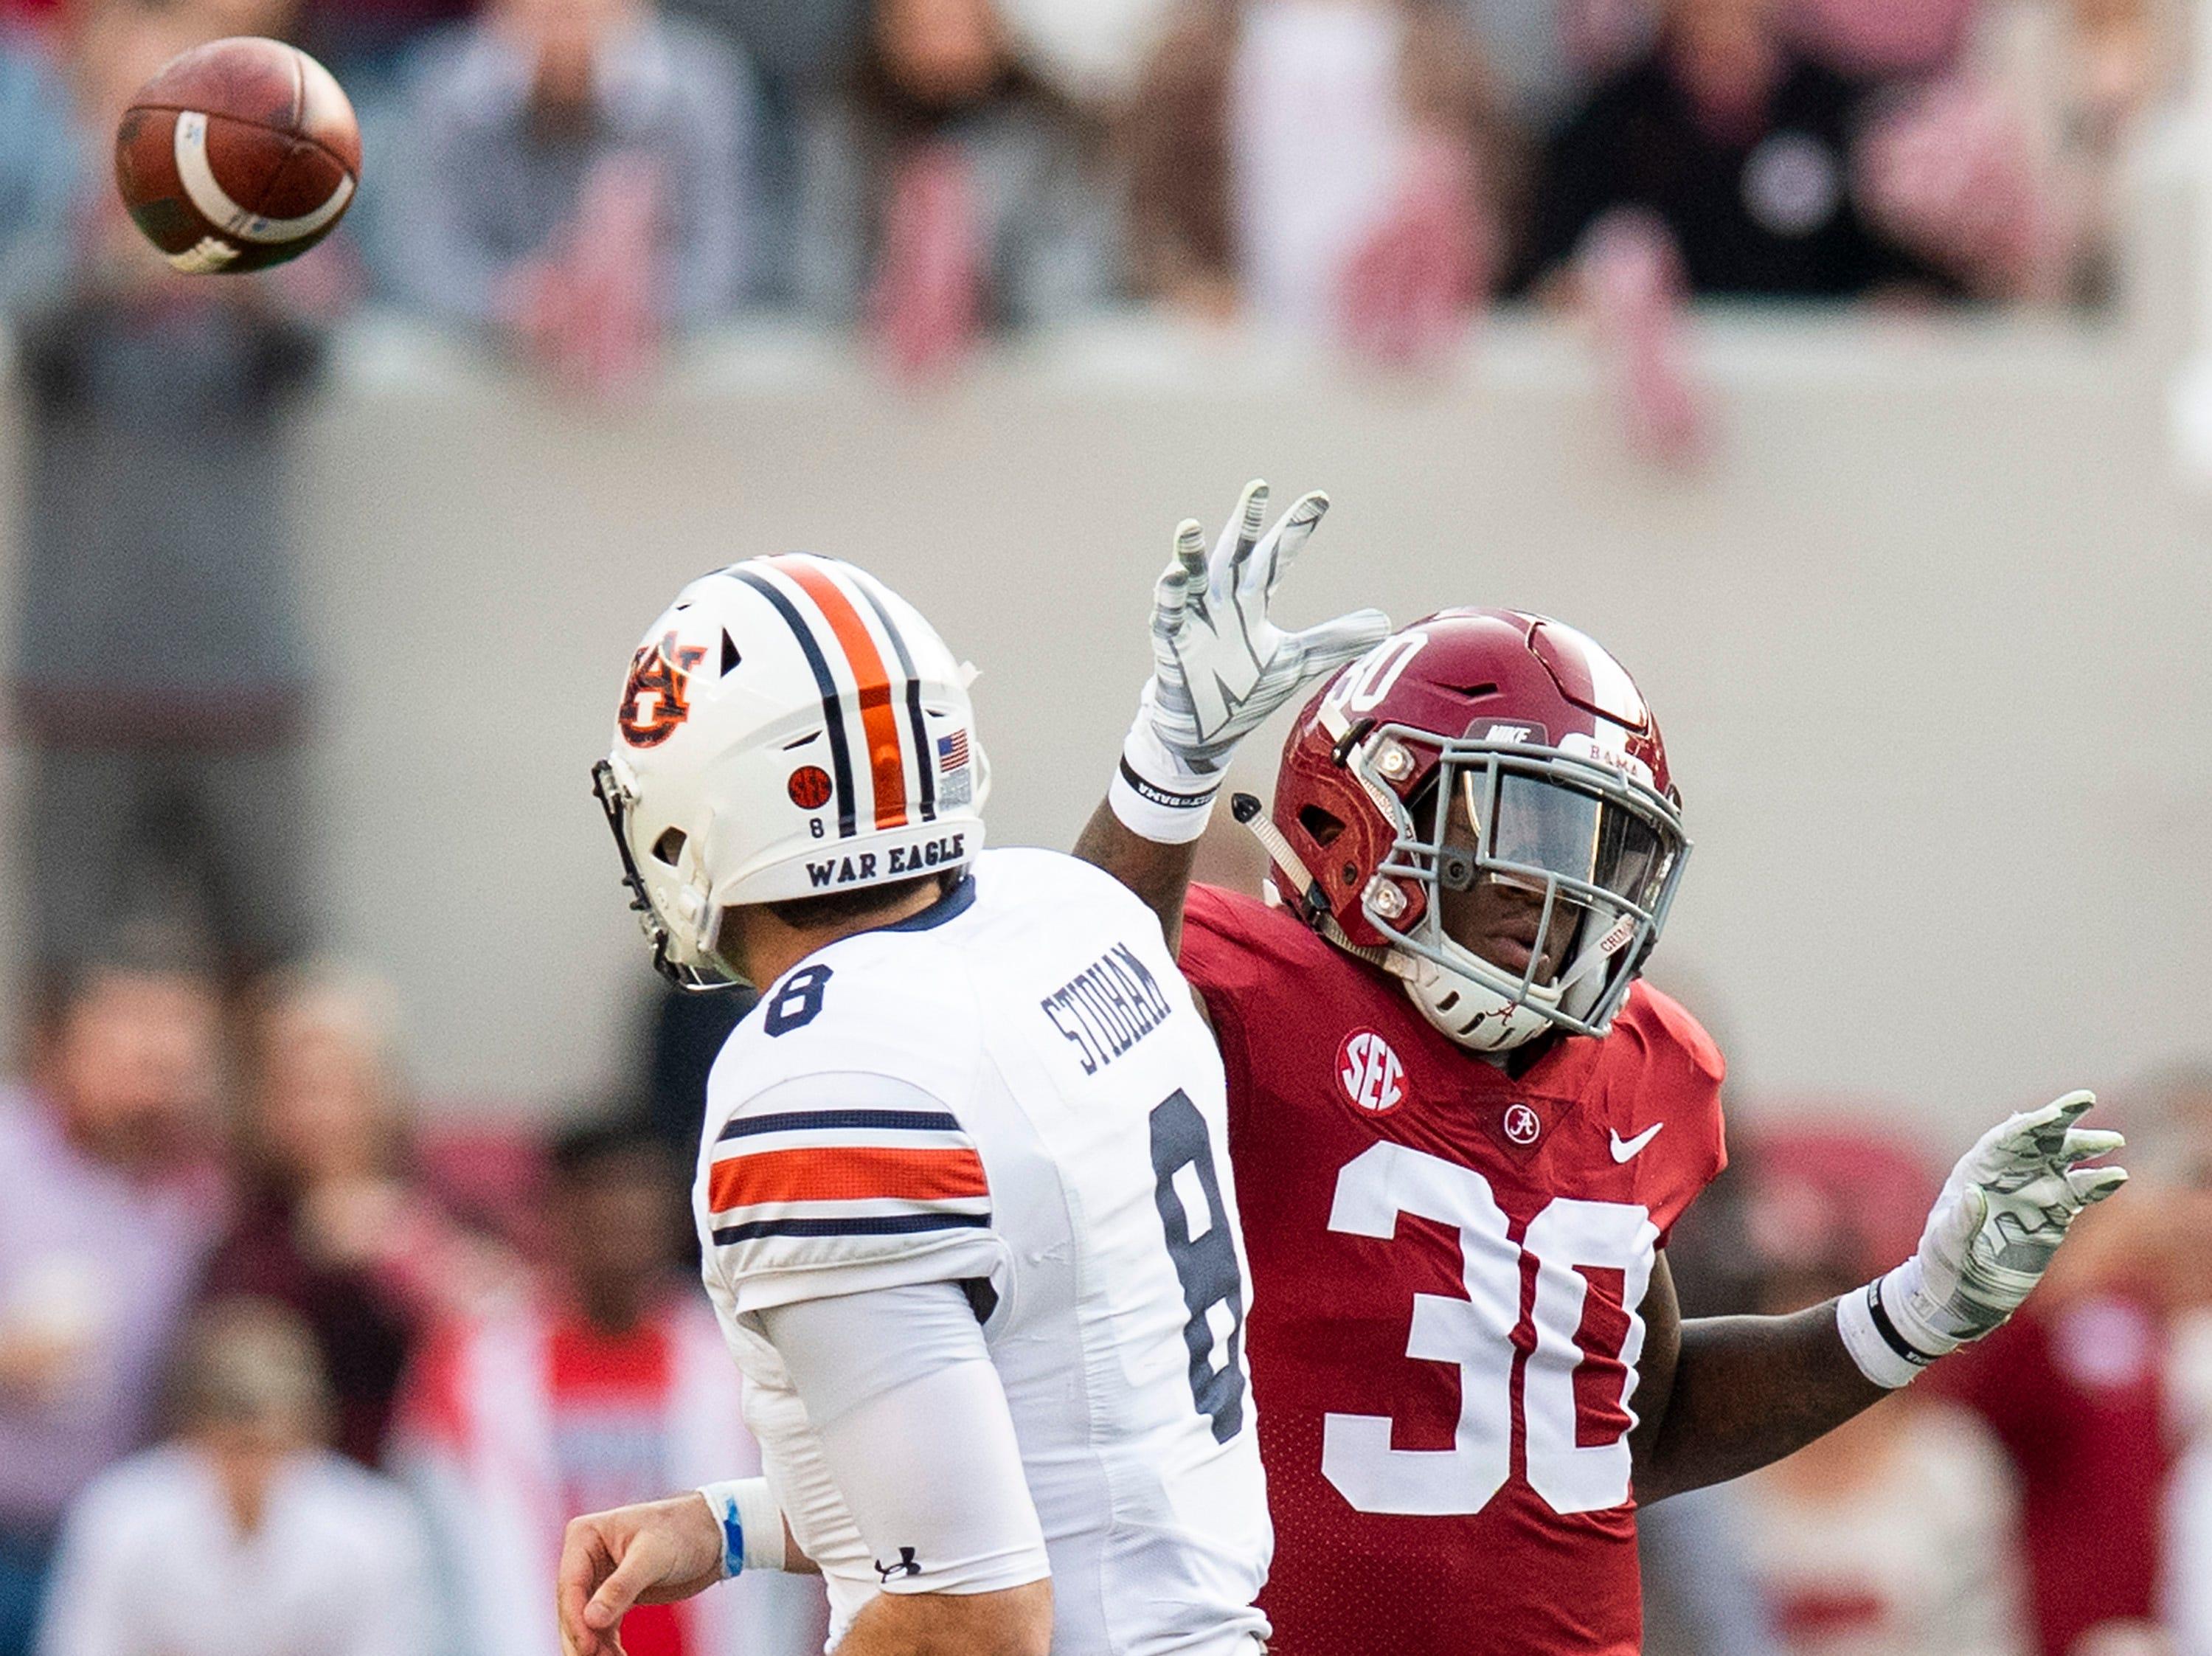 Alabama linebacker Mack Wilson (30) pressures Auburn quarterback Jarrett Stidham (8) in first half action during the Iron Bowl at Bryant-Denny Stadium in Tuscaloosa, Ala., on Saturday November 24, 2018.